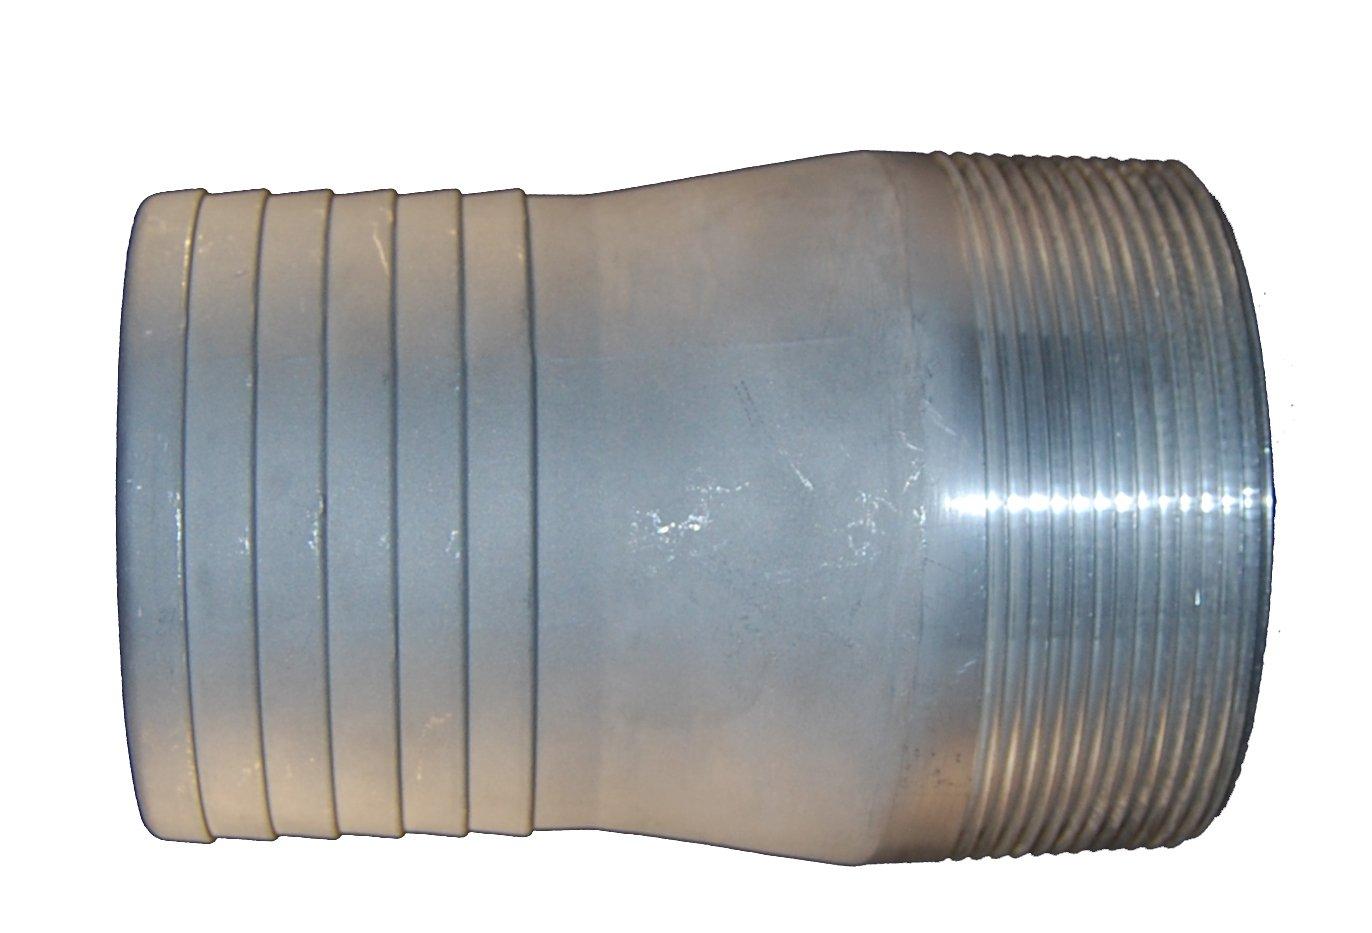 PT Coupling PTCN Series Plain Steel Fitting 4 Hose Shank x NPT Male 4 Hose Shank x NPT Male Combination Nipple